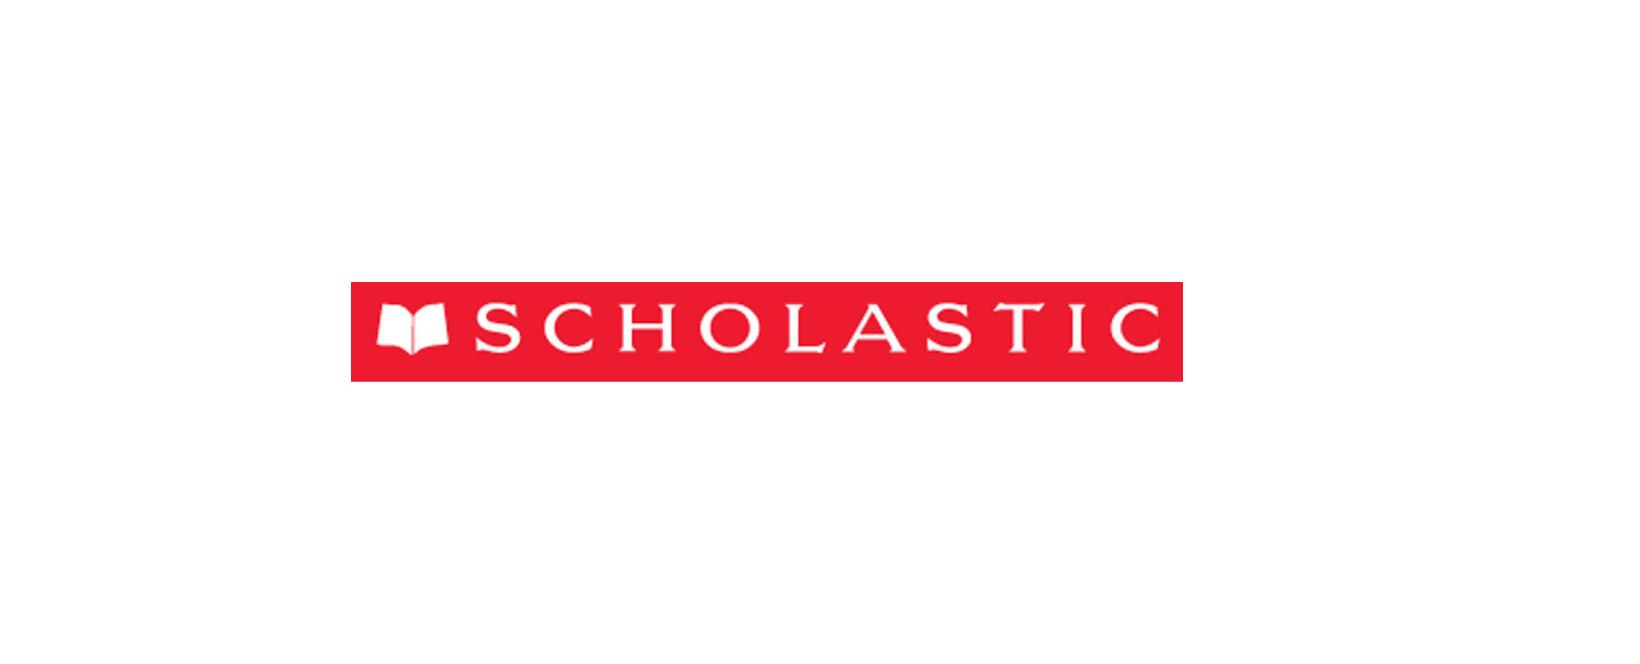 Scholastic Discount Code 2021